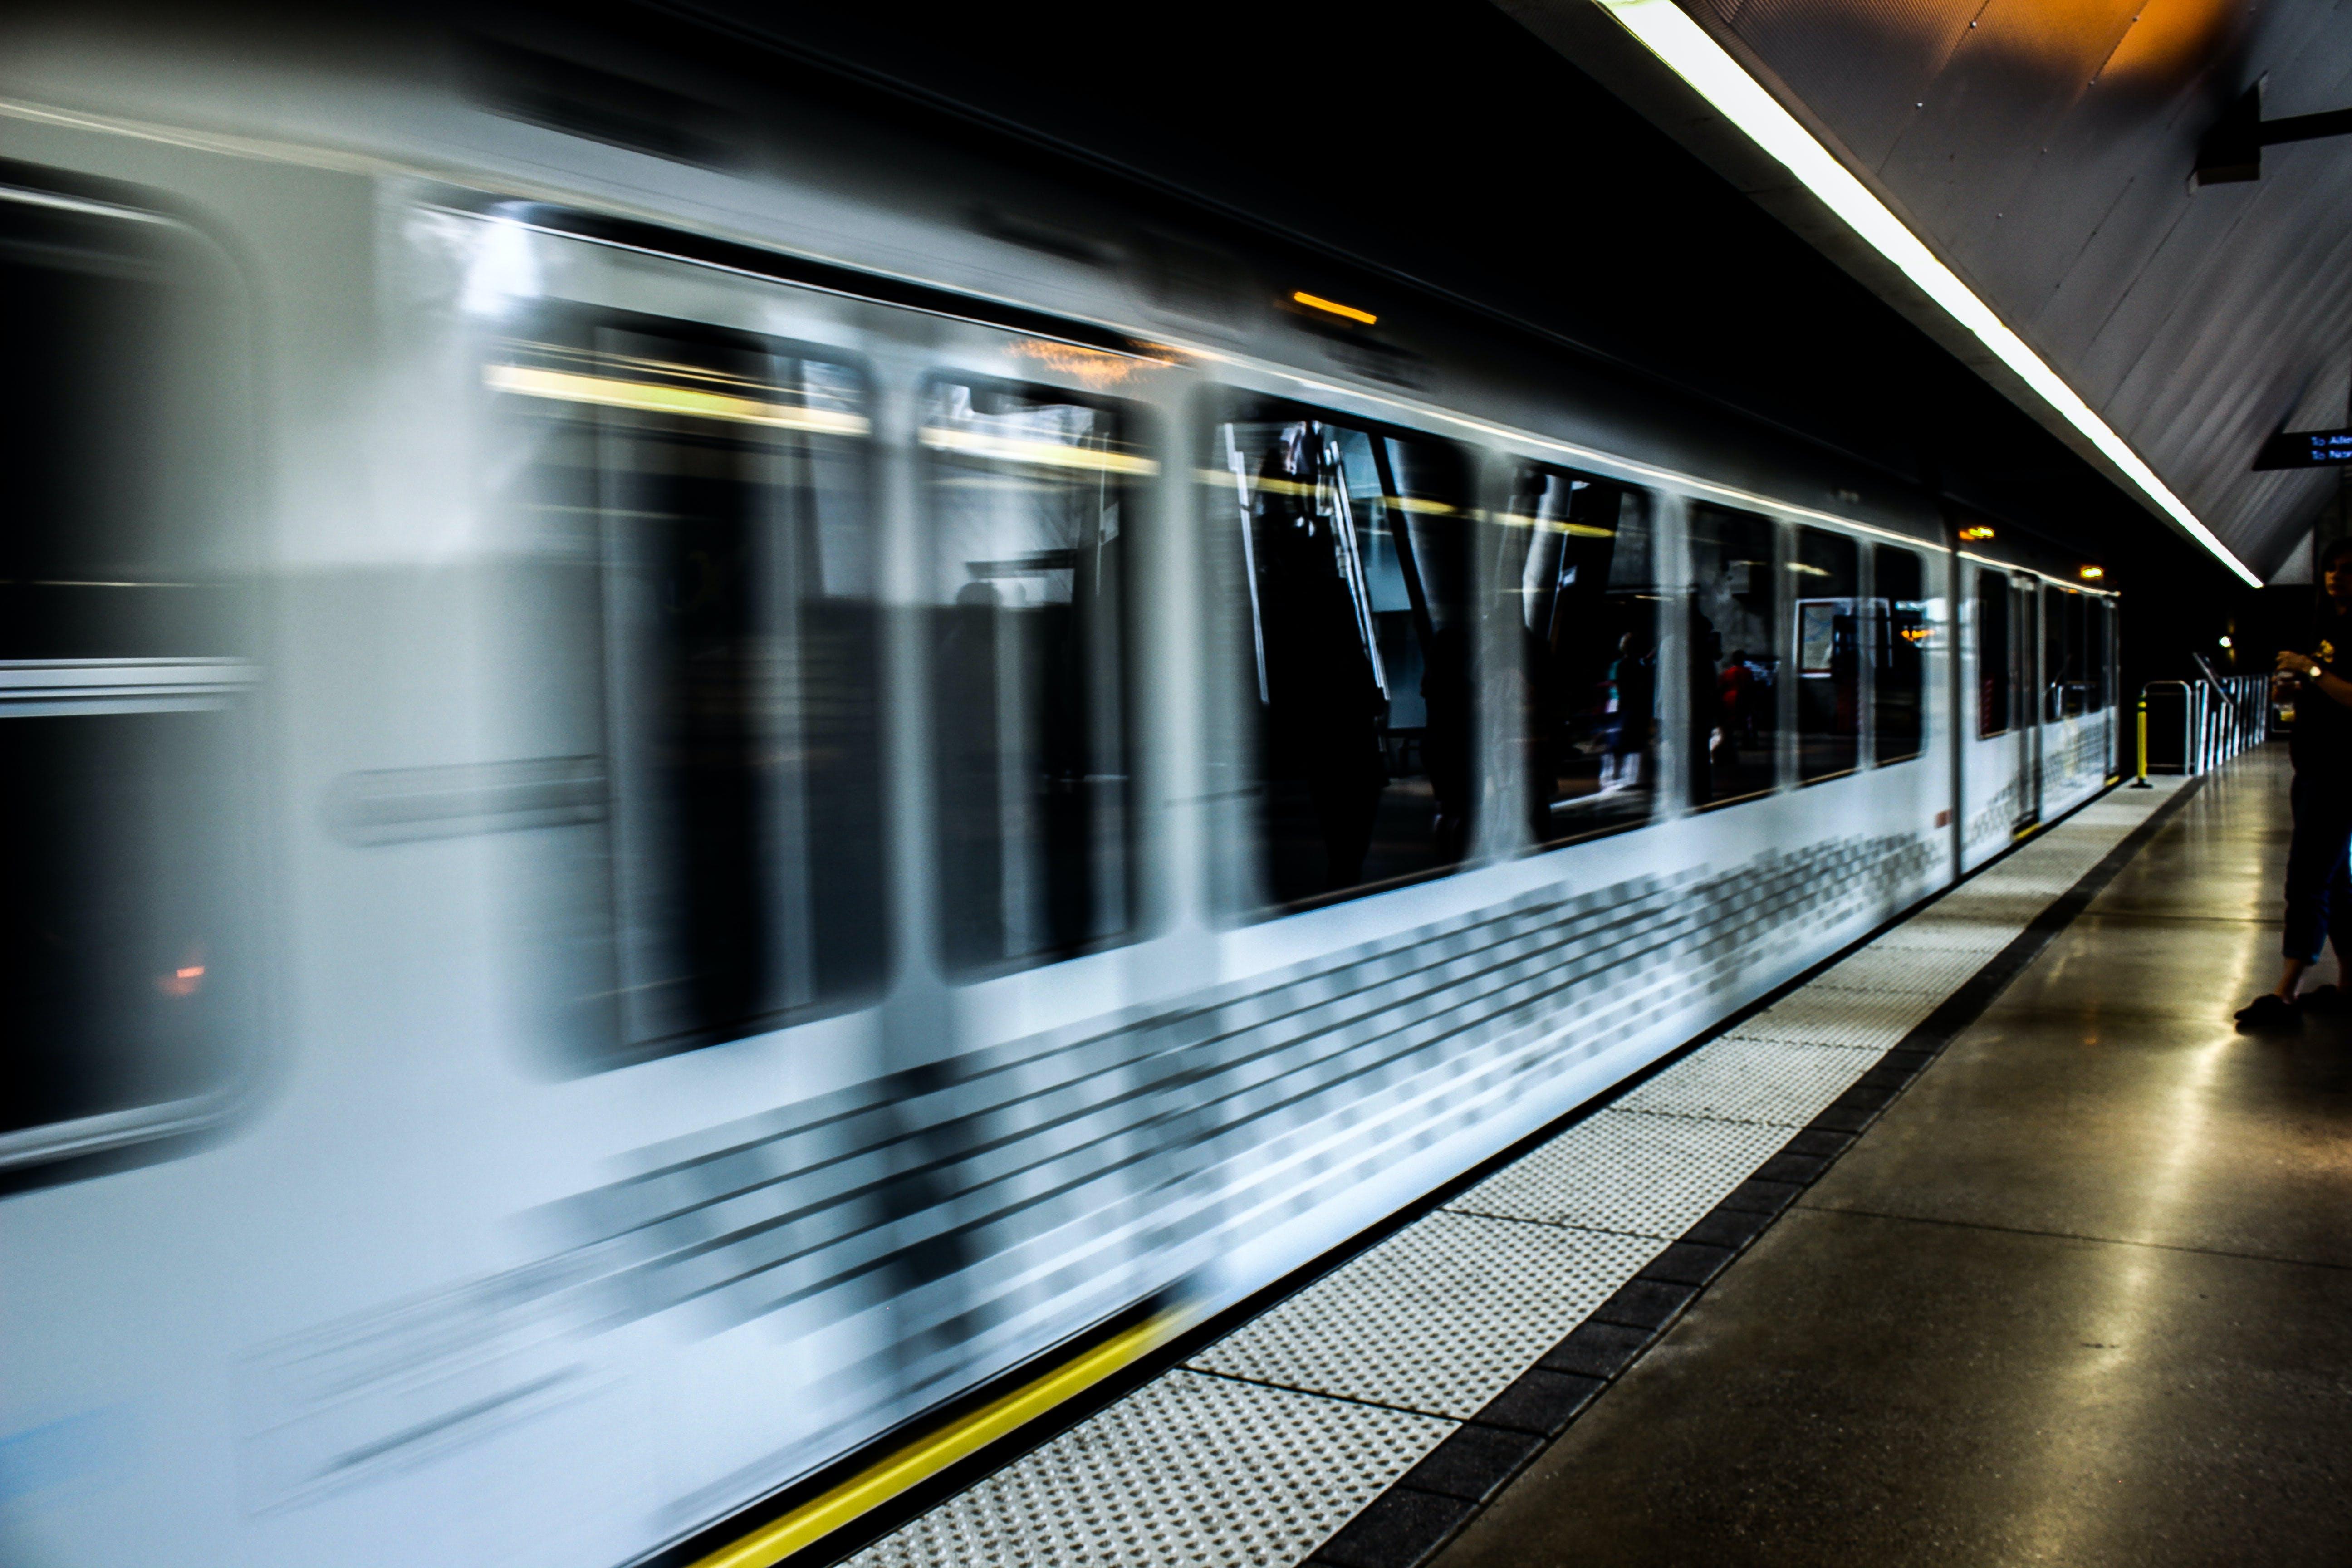 blur, departure, fast